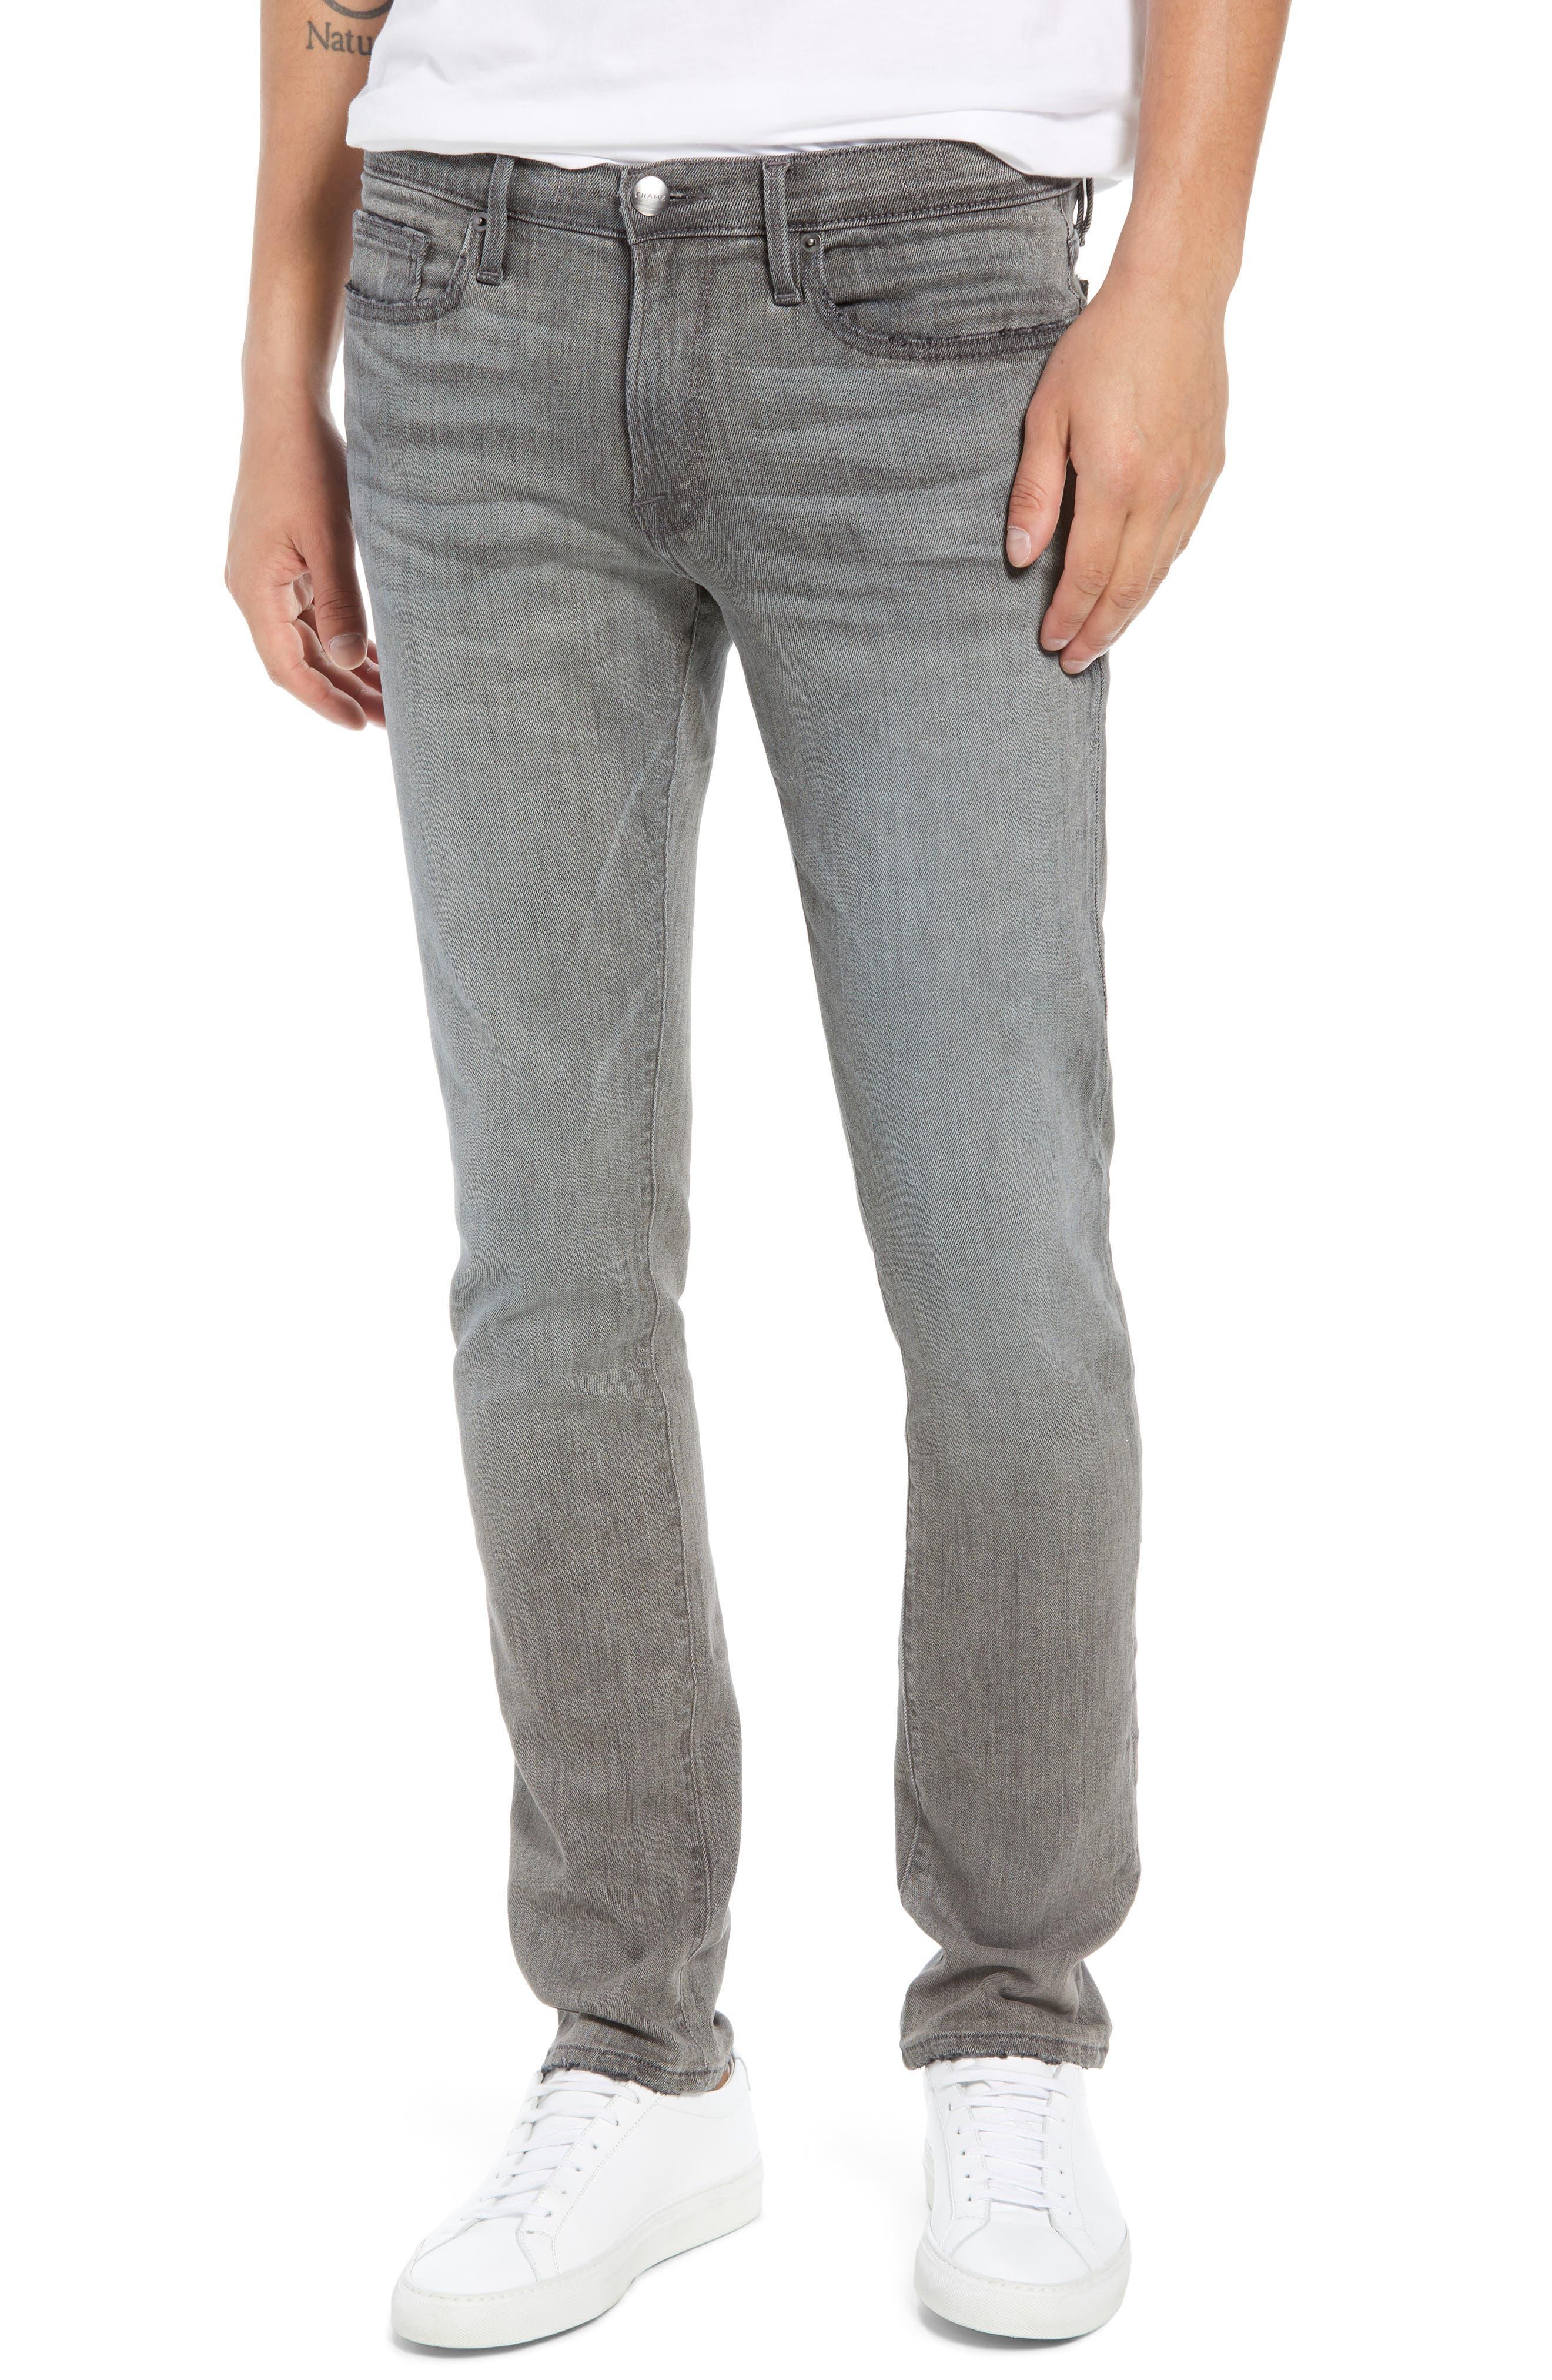 L'Homme Skinny Skinny Fit Jeans,                         Main,                         color, FORT MCHEN